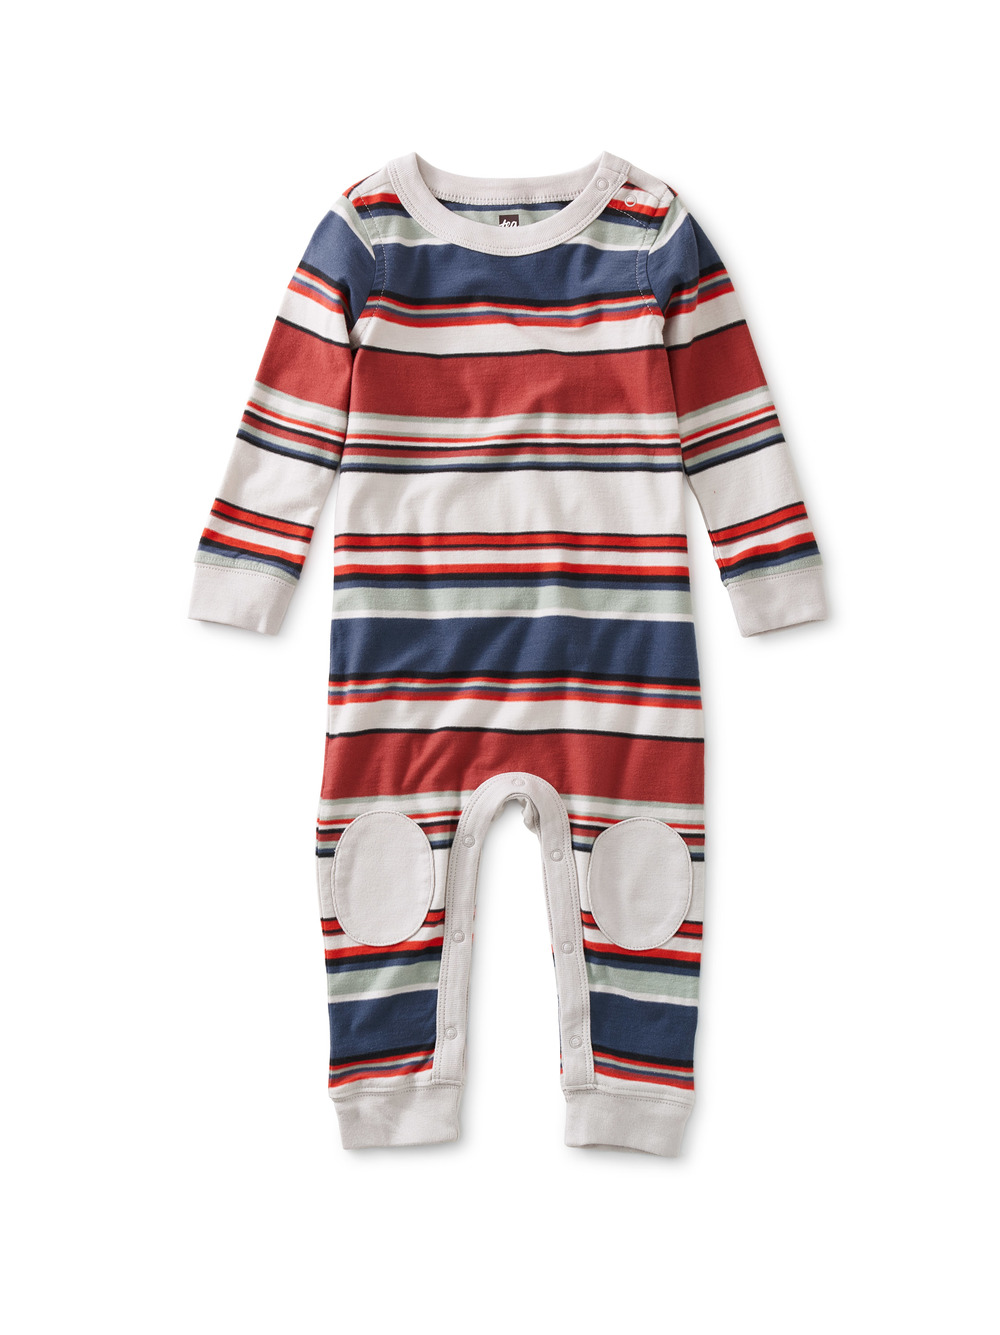 Stripe Knee Patch Baby Romper